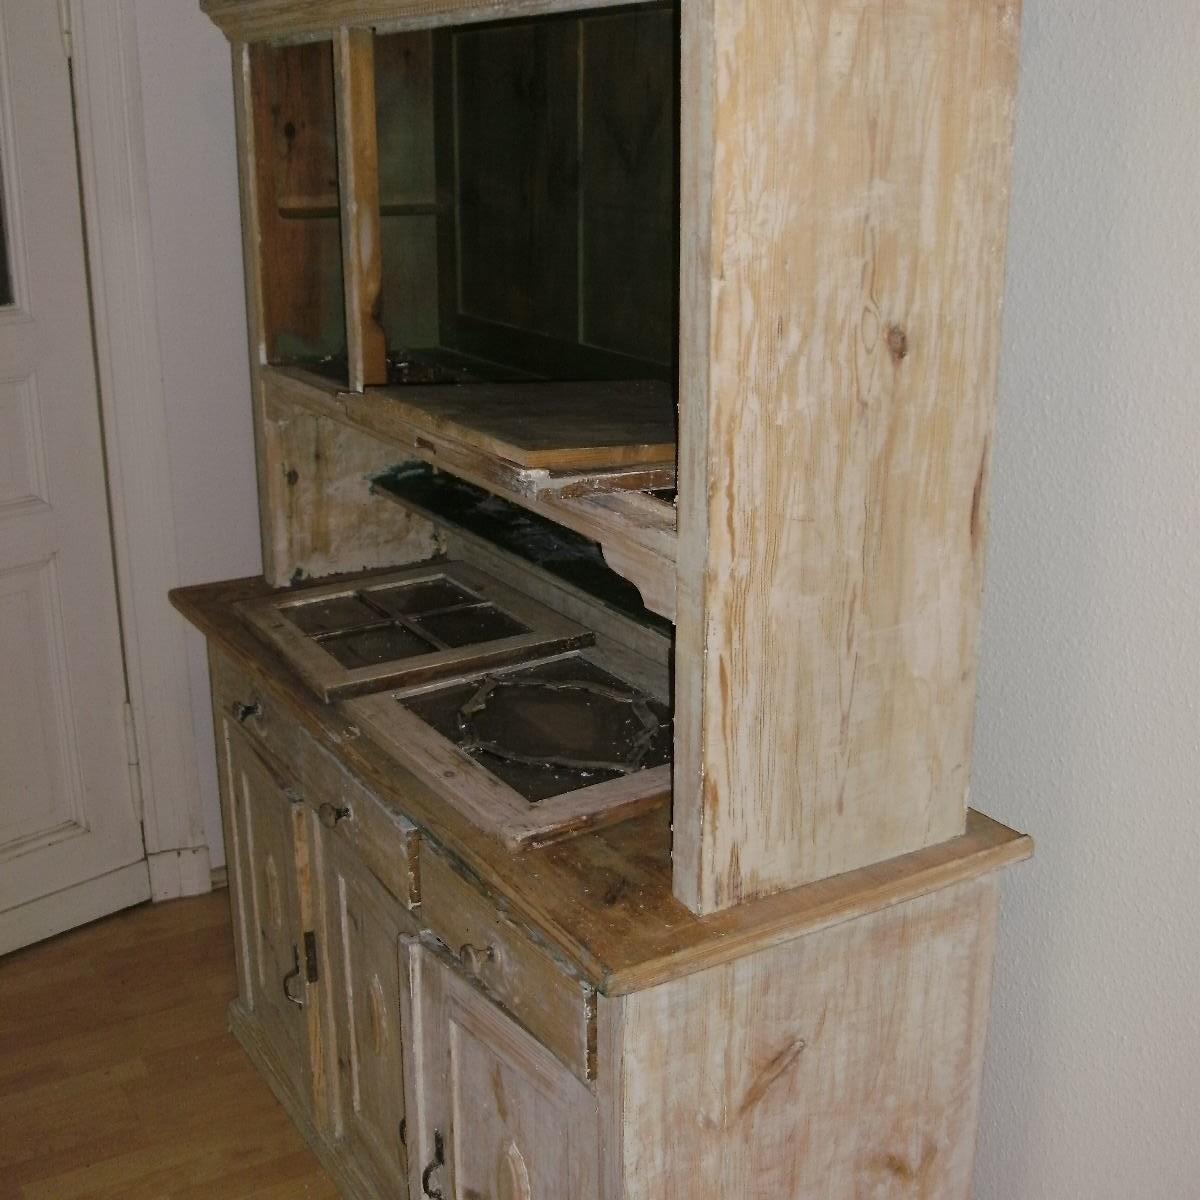 Bau u.Möbelhandwerk, Küchenbüffet orginal Zustand